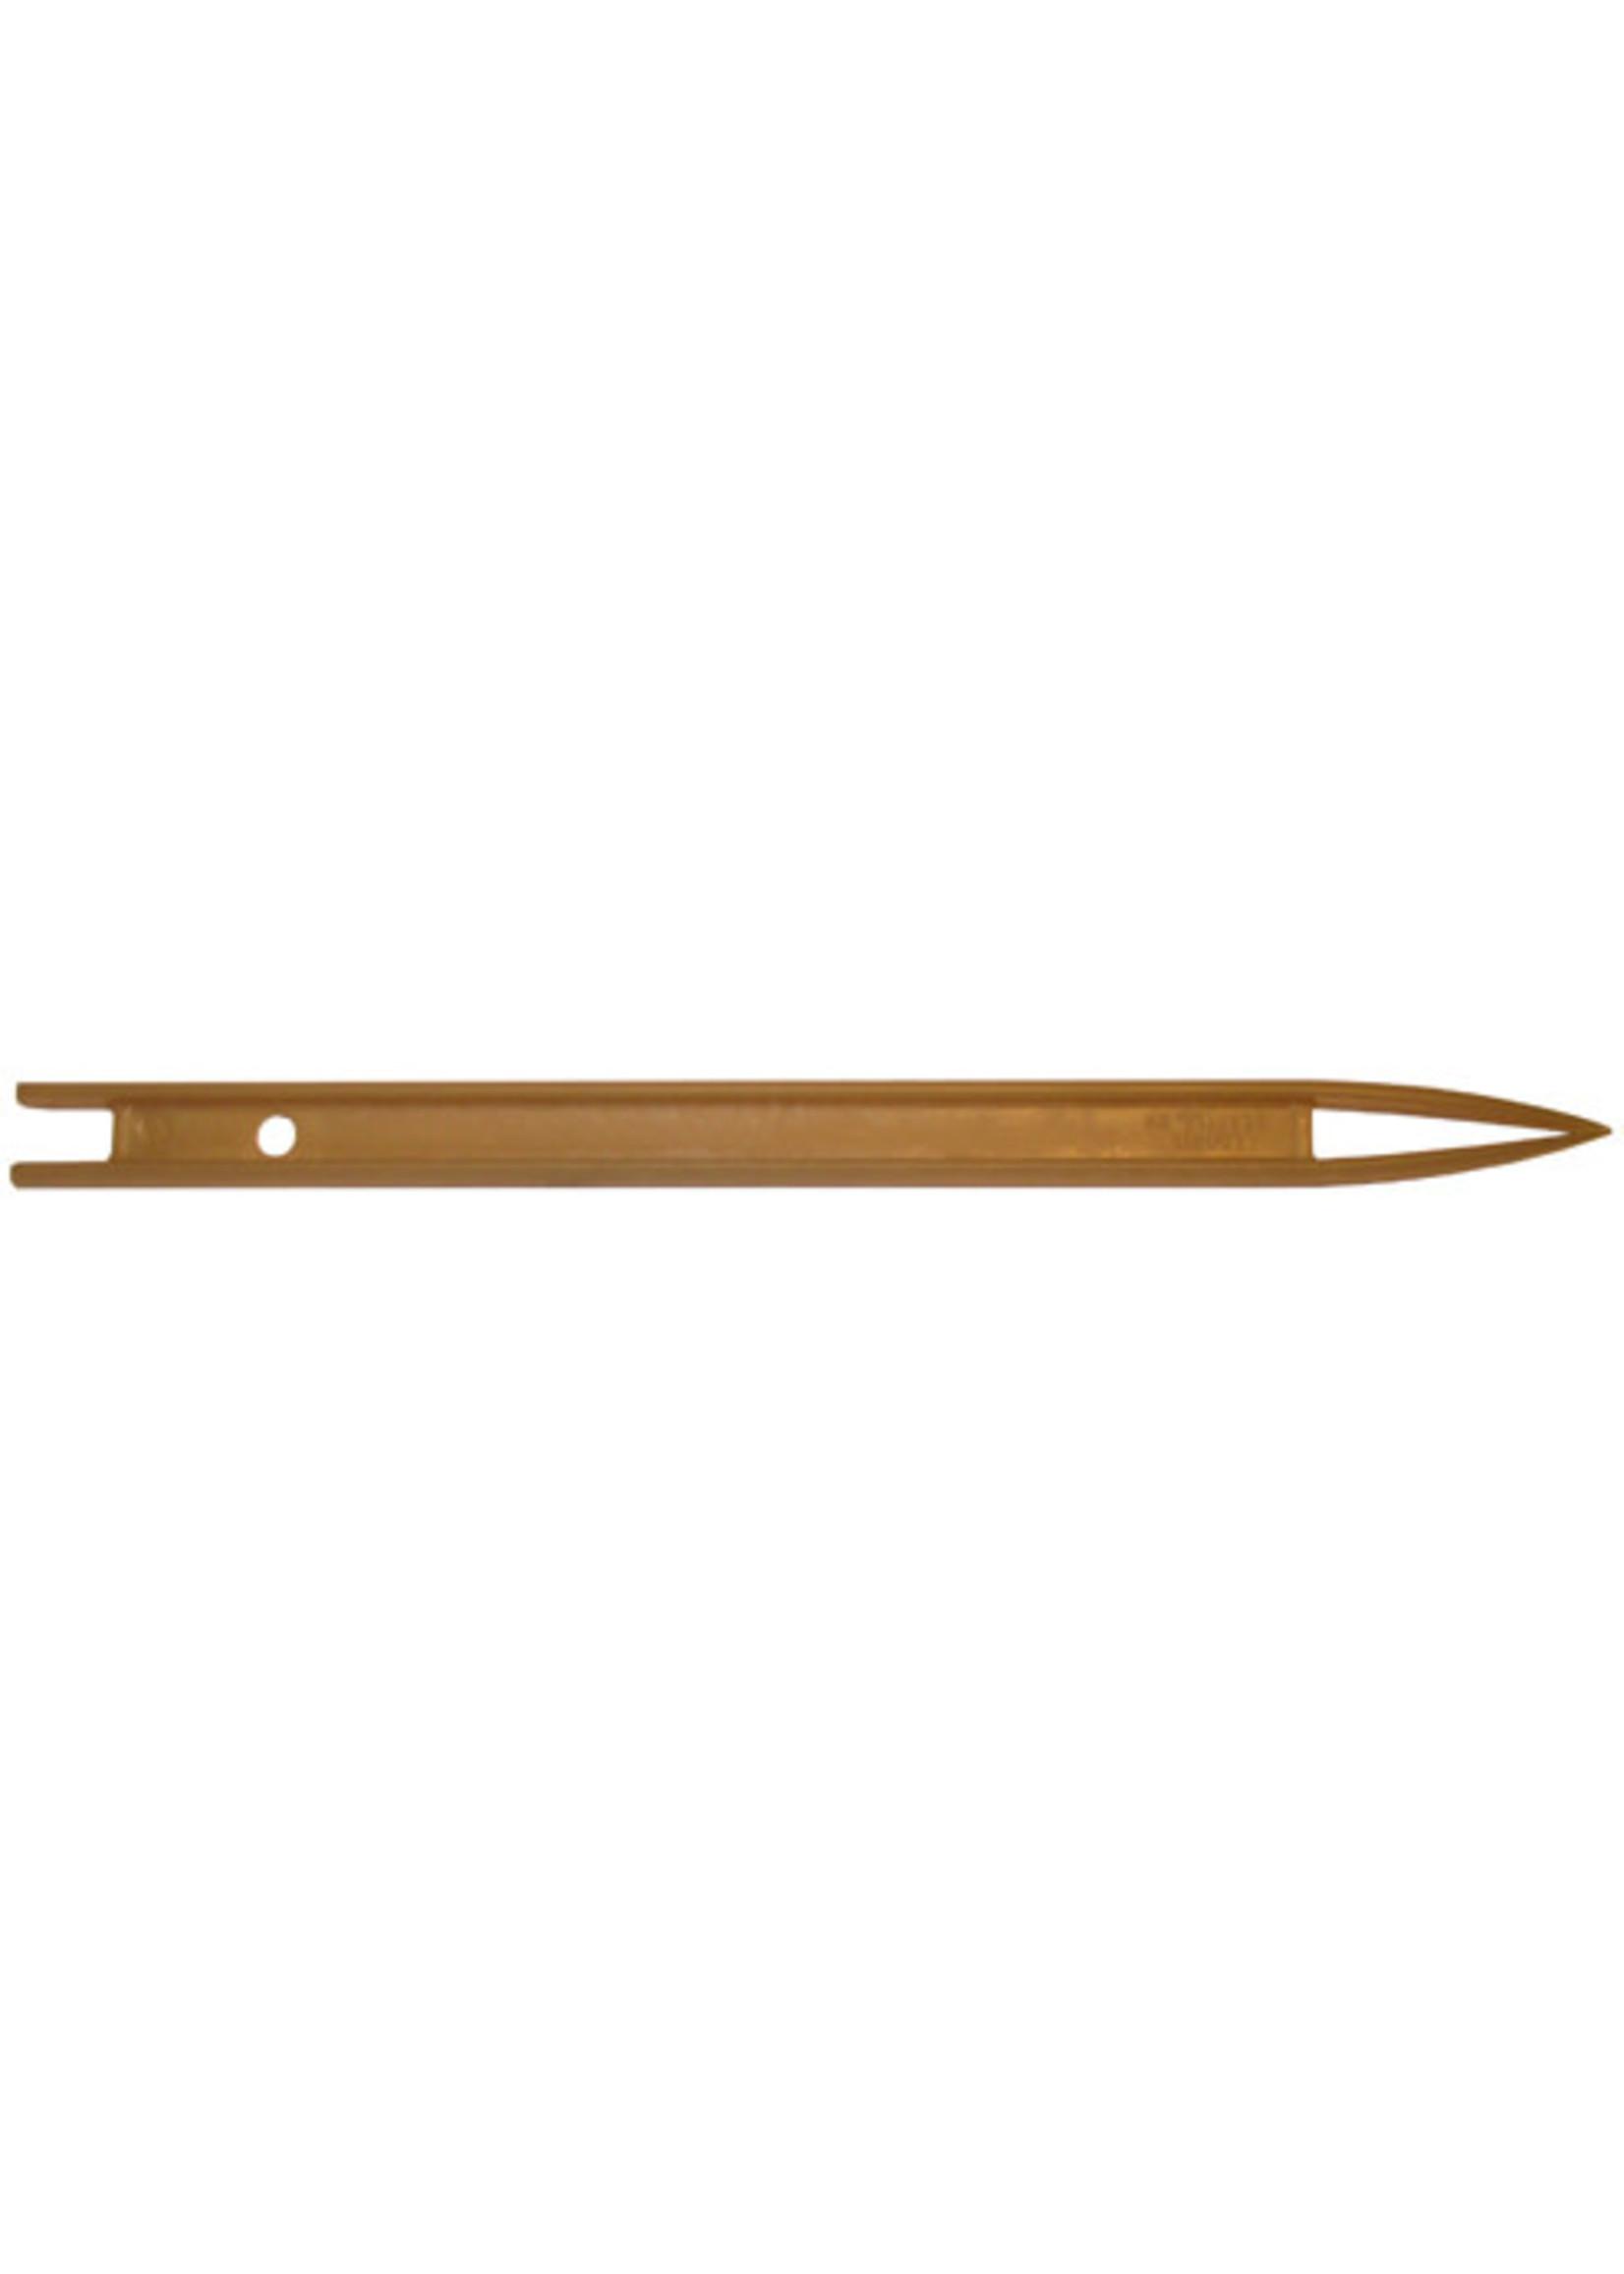 "SEATTLE MARINE Net Needle 5/8""X10"""